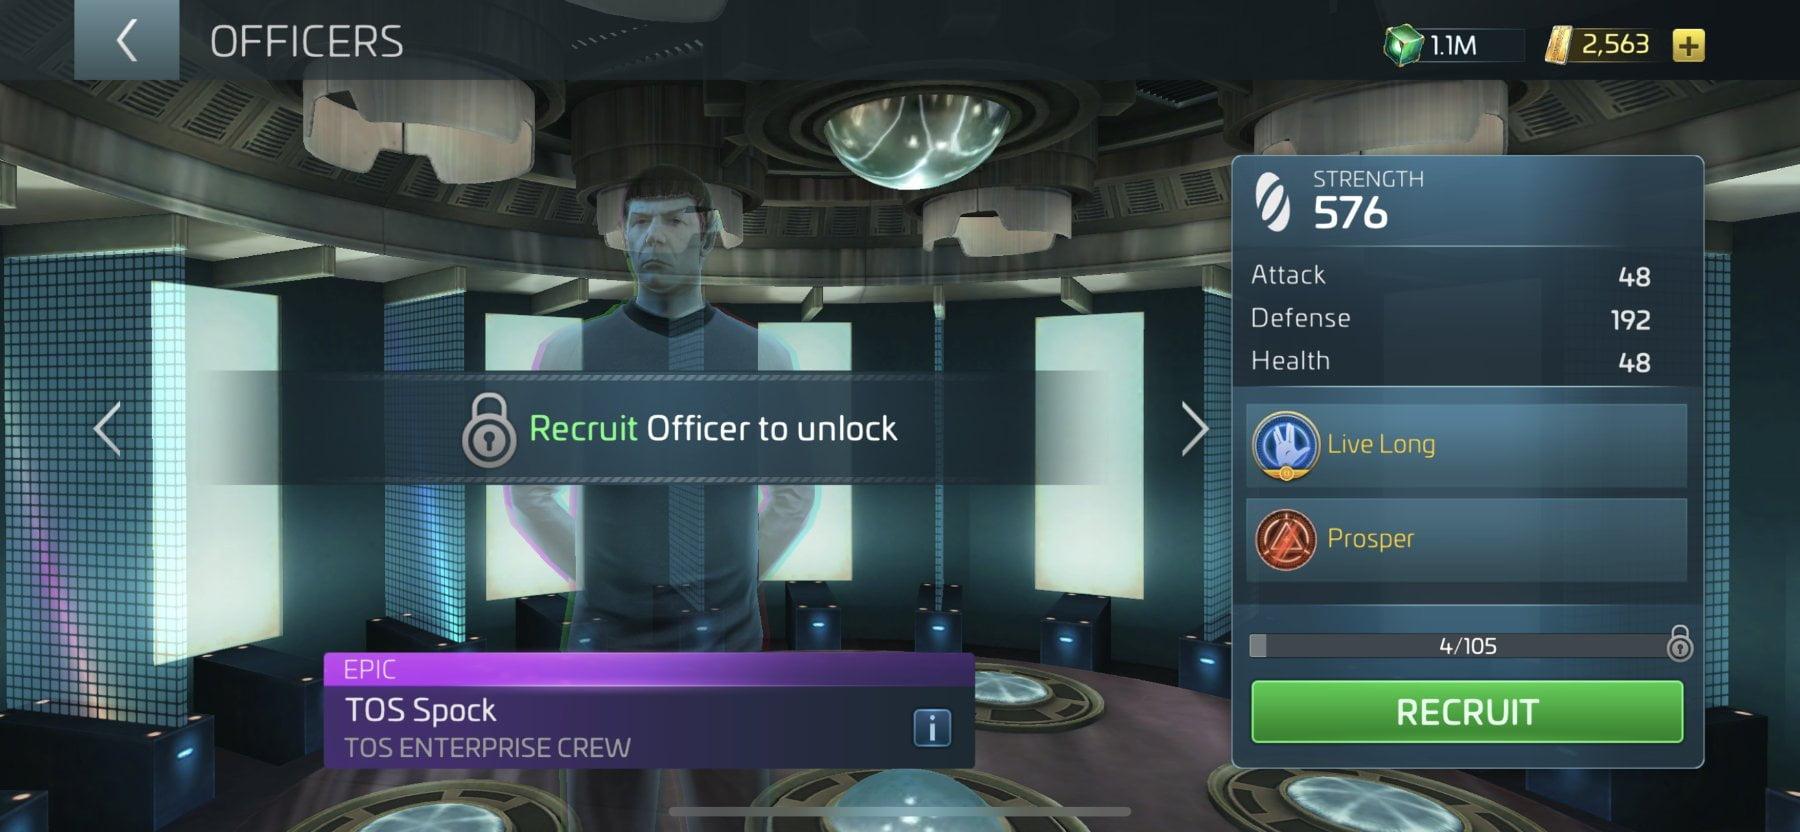 Star Trek Fleet Command Officer TOS Spock